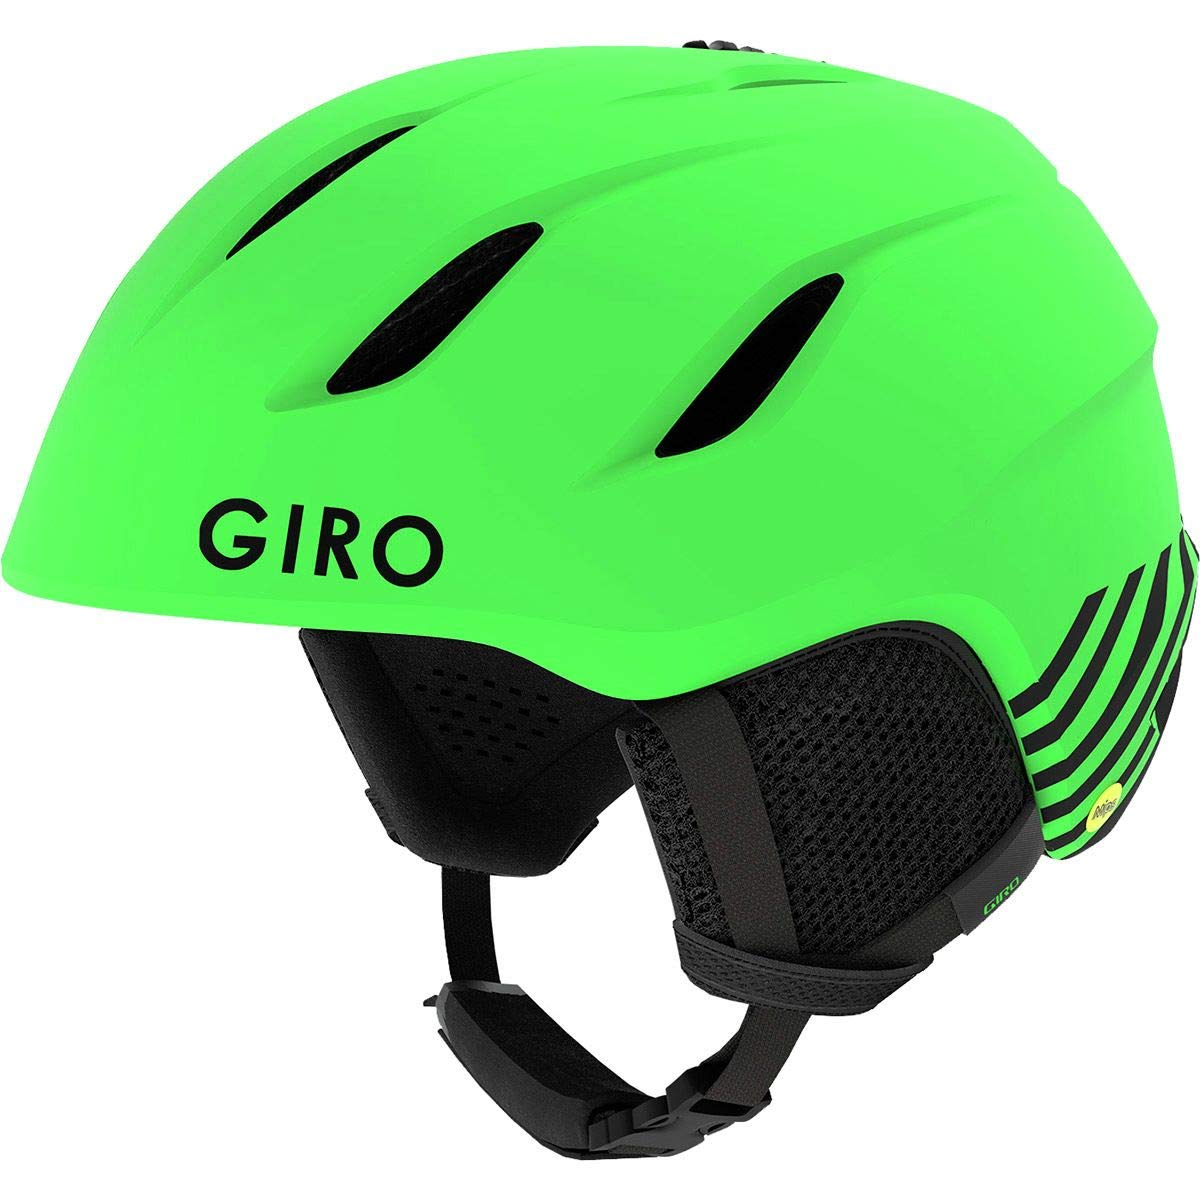 Giro Nine Jr Ski-/Snowboardhelm Unisex Kinder